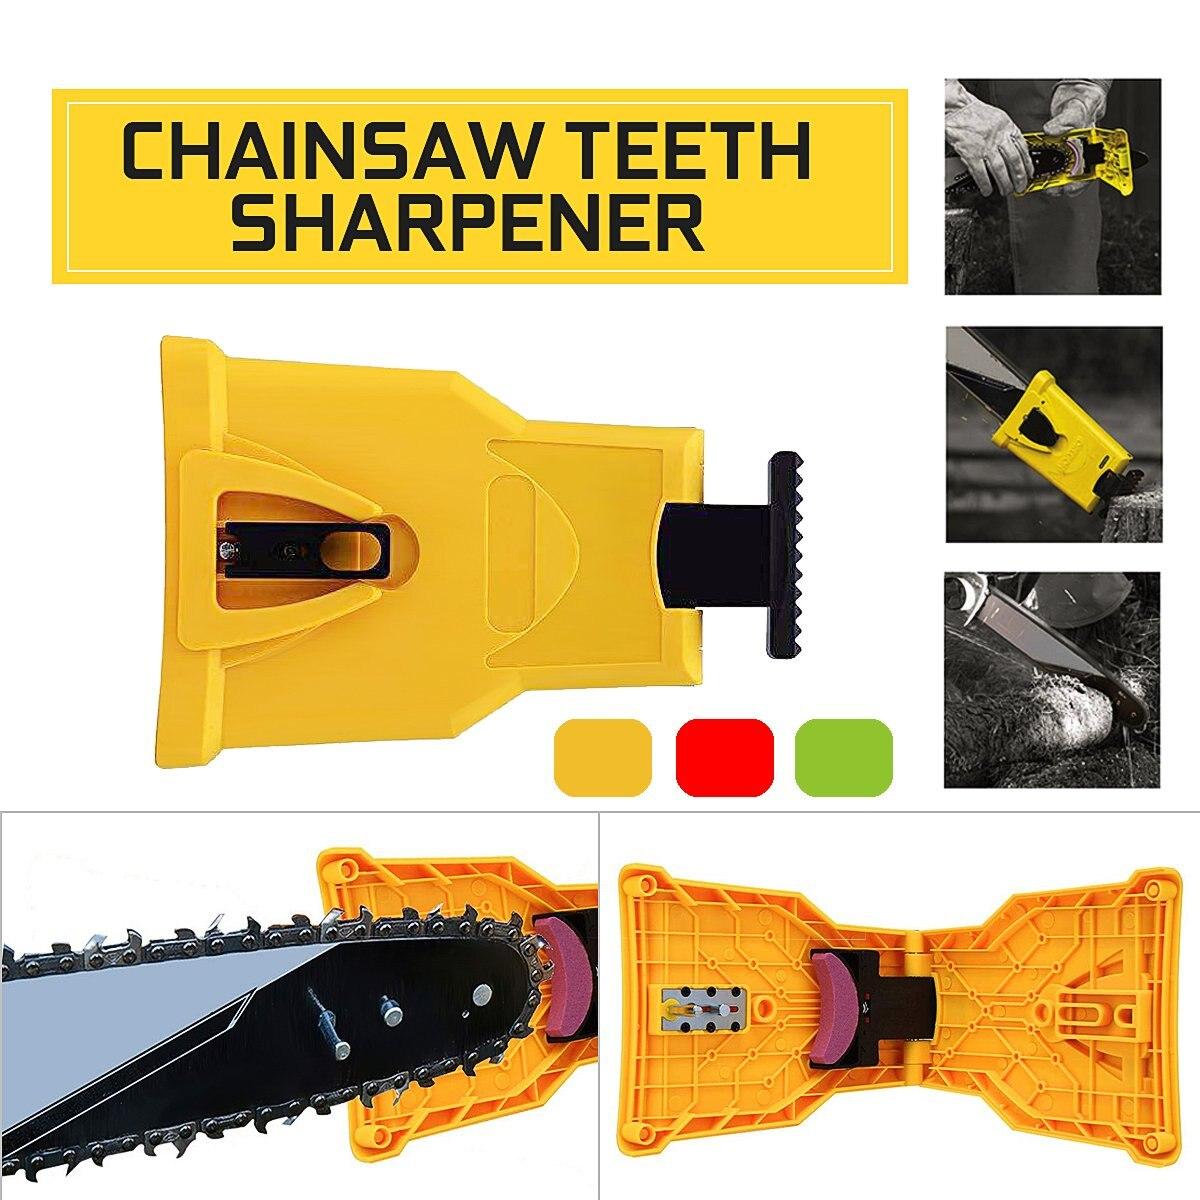 Chainsaw Teeths Sharpener Self Sharpening Grinder Teeths Sharpening Electric Power Chain Saw Chain Sharpener Woodworking Tools